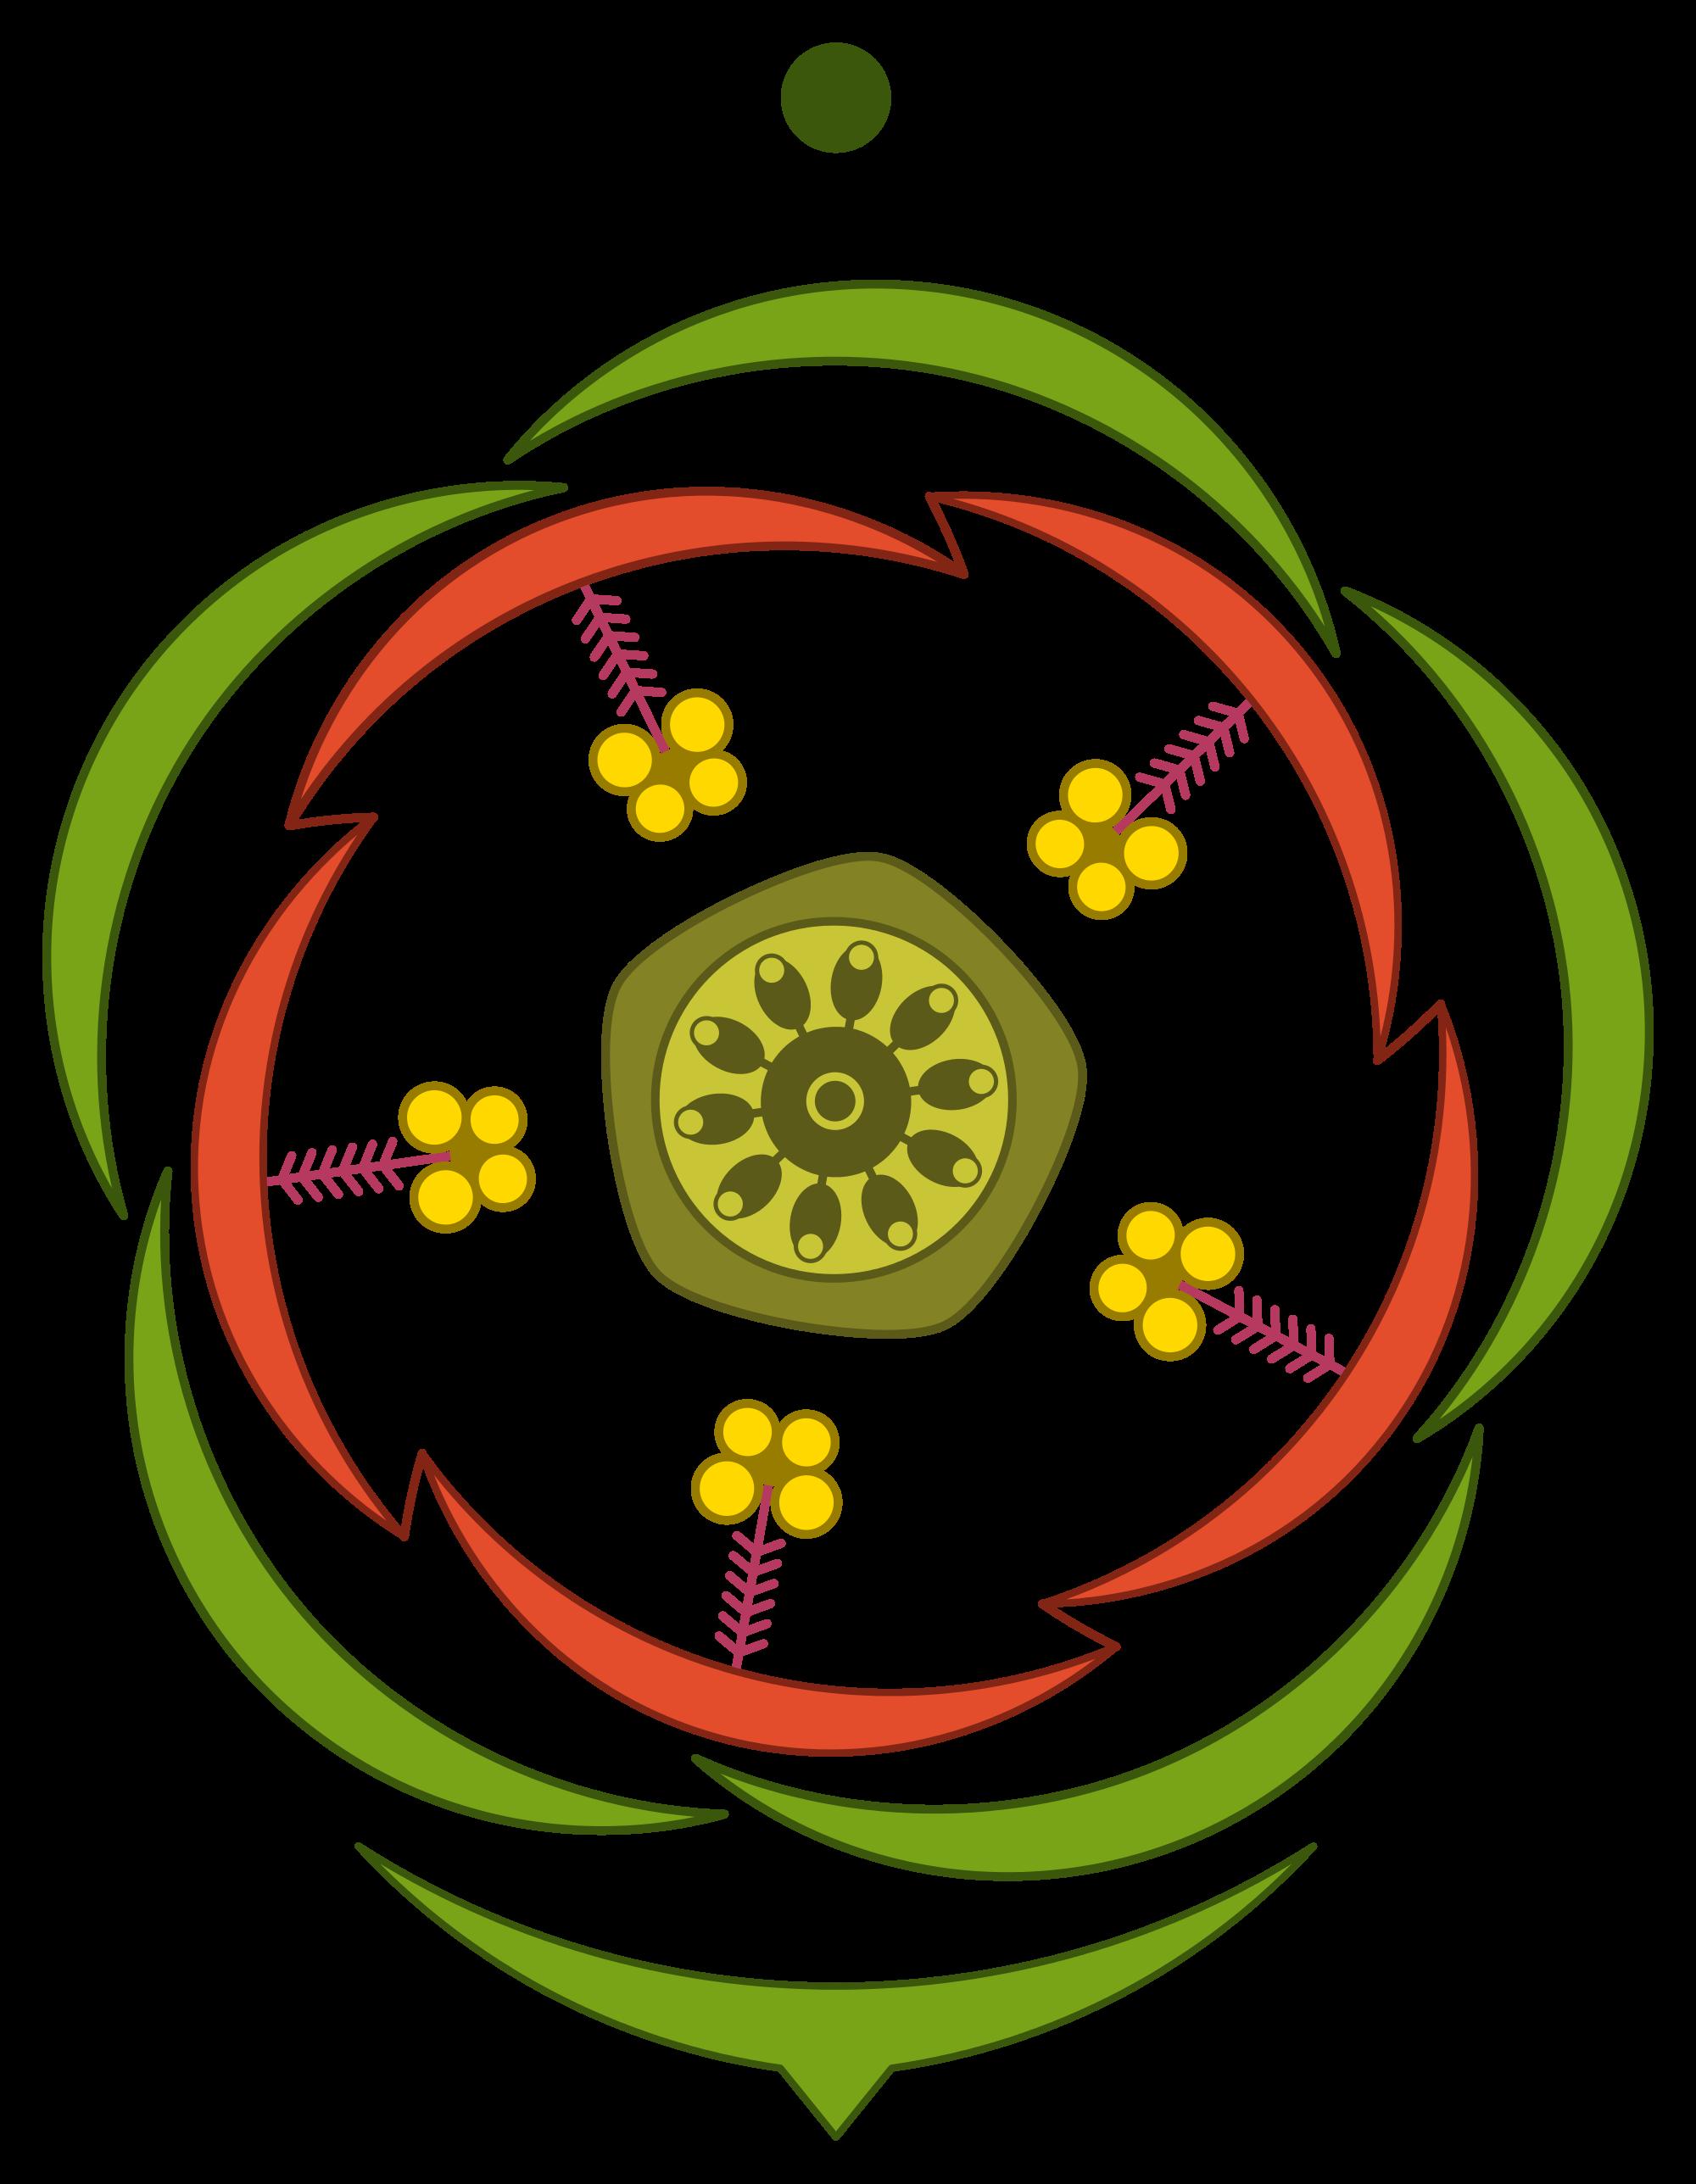 File:Floral diagram.